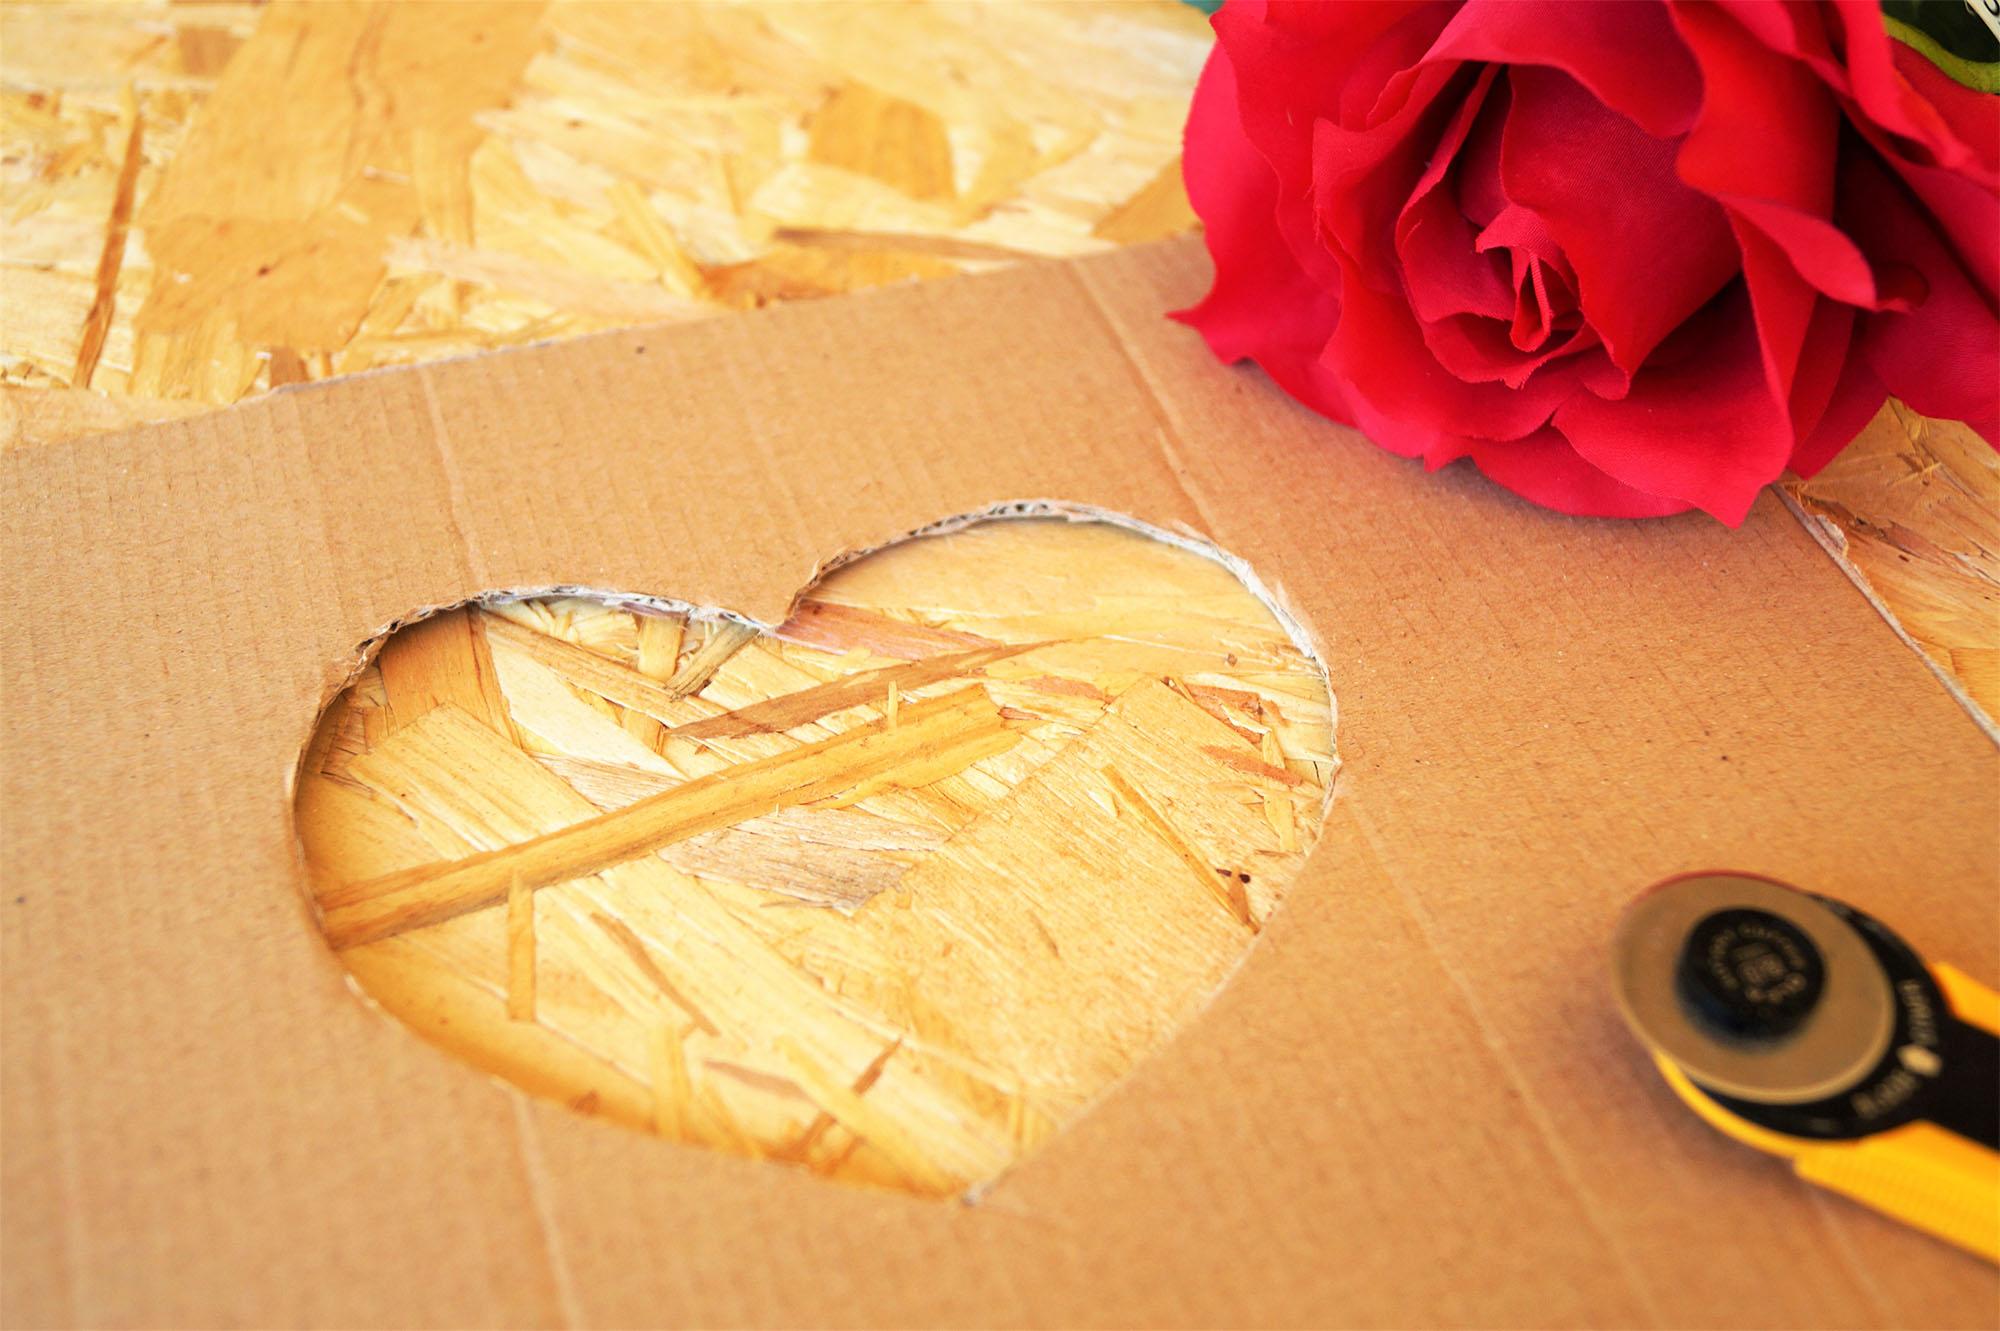 fabriquer un cadeau de saint valentin. Black Bedroom Furniture Sets. Home Design Ideas